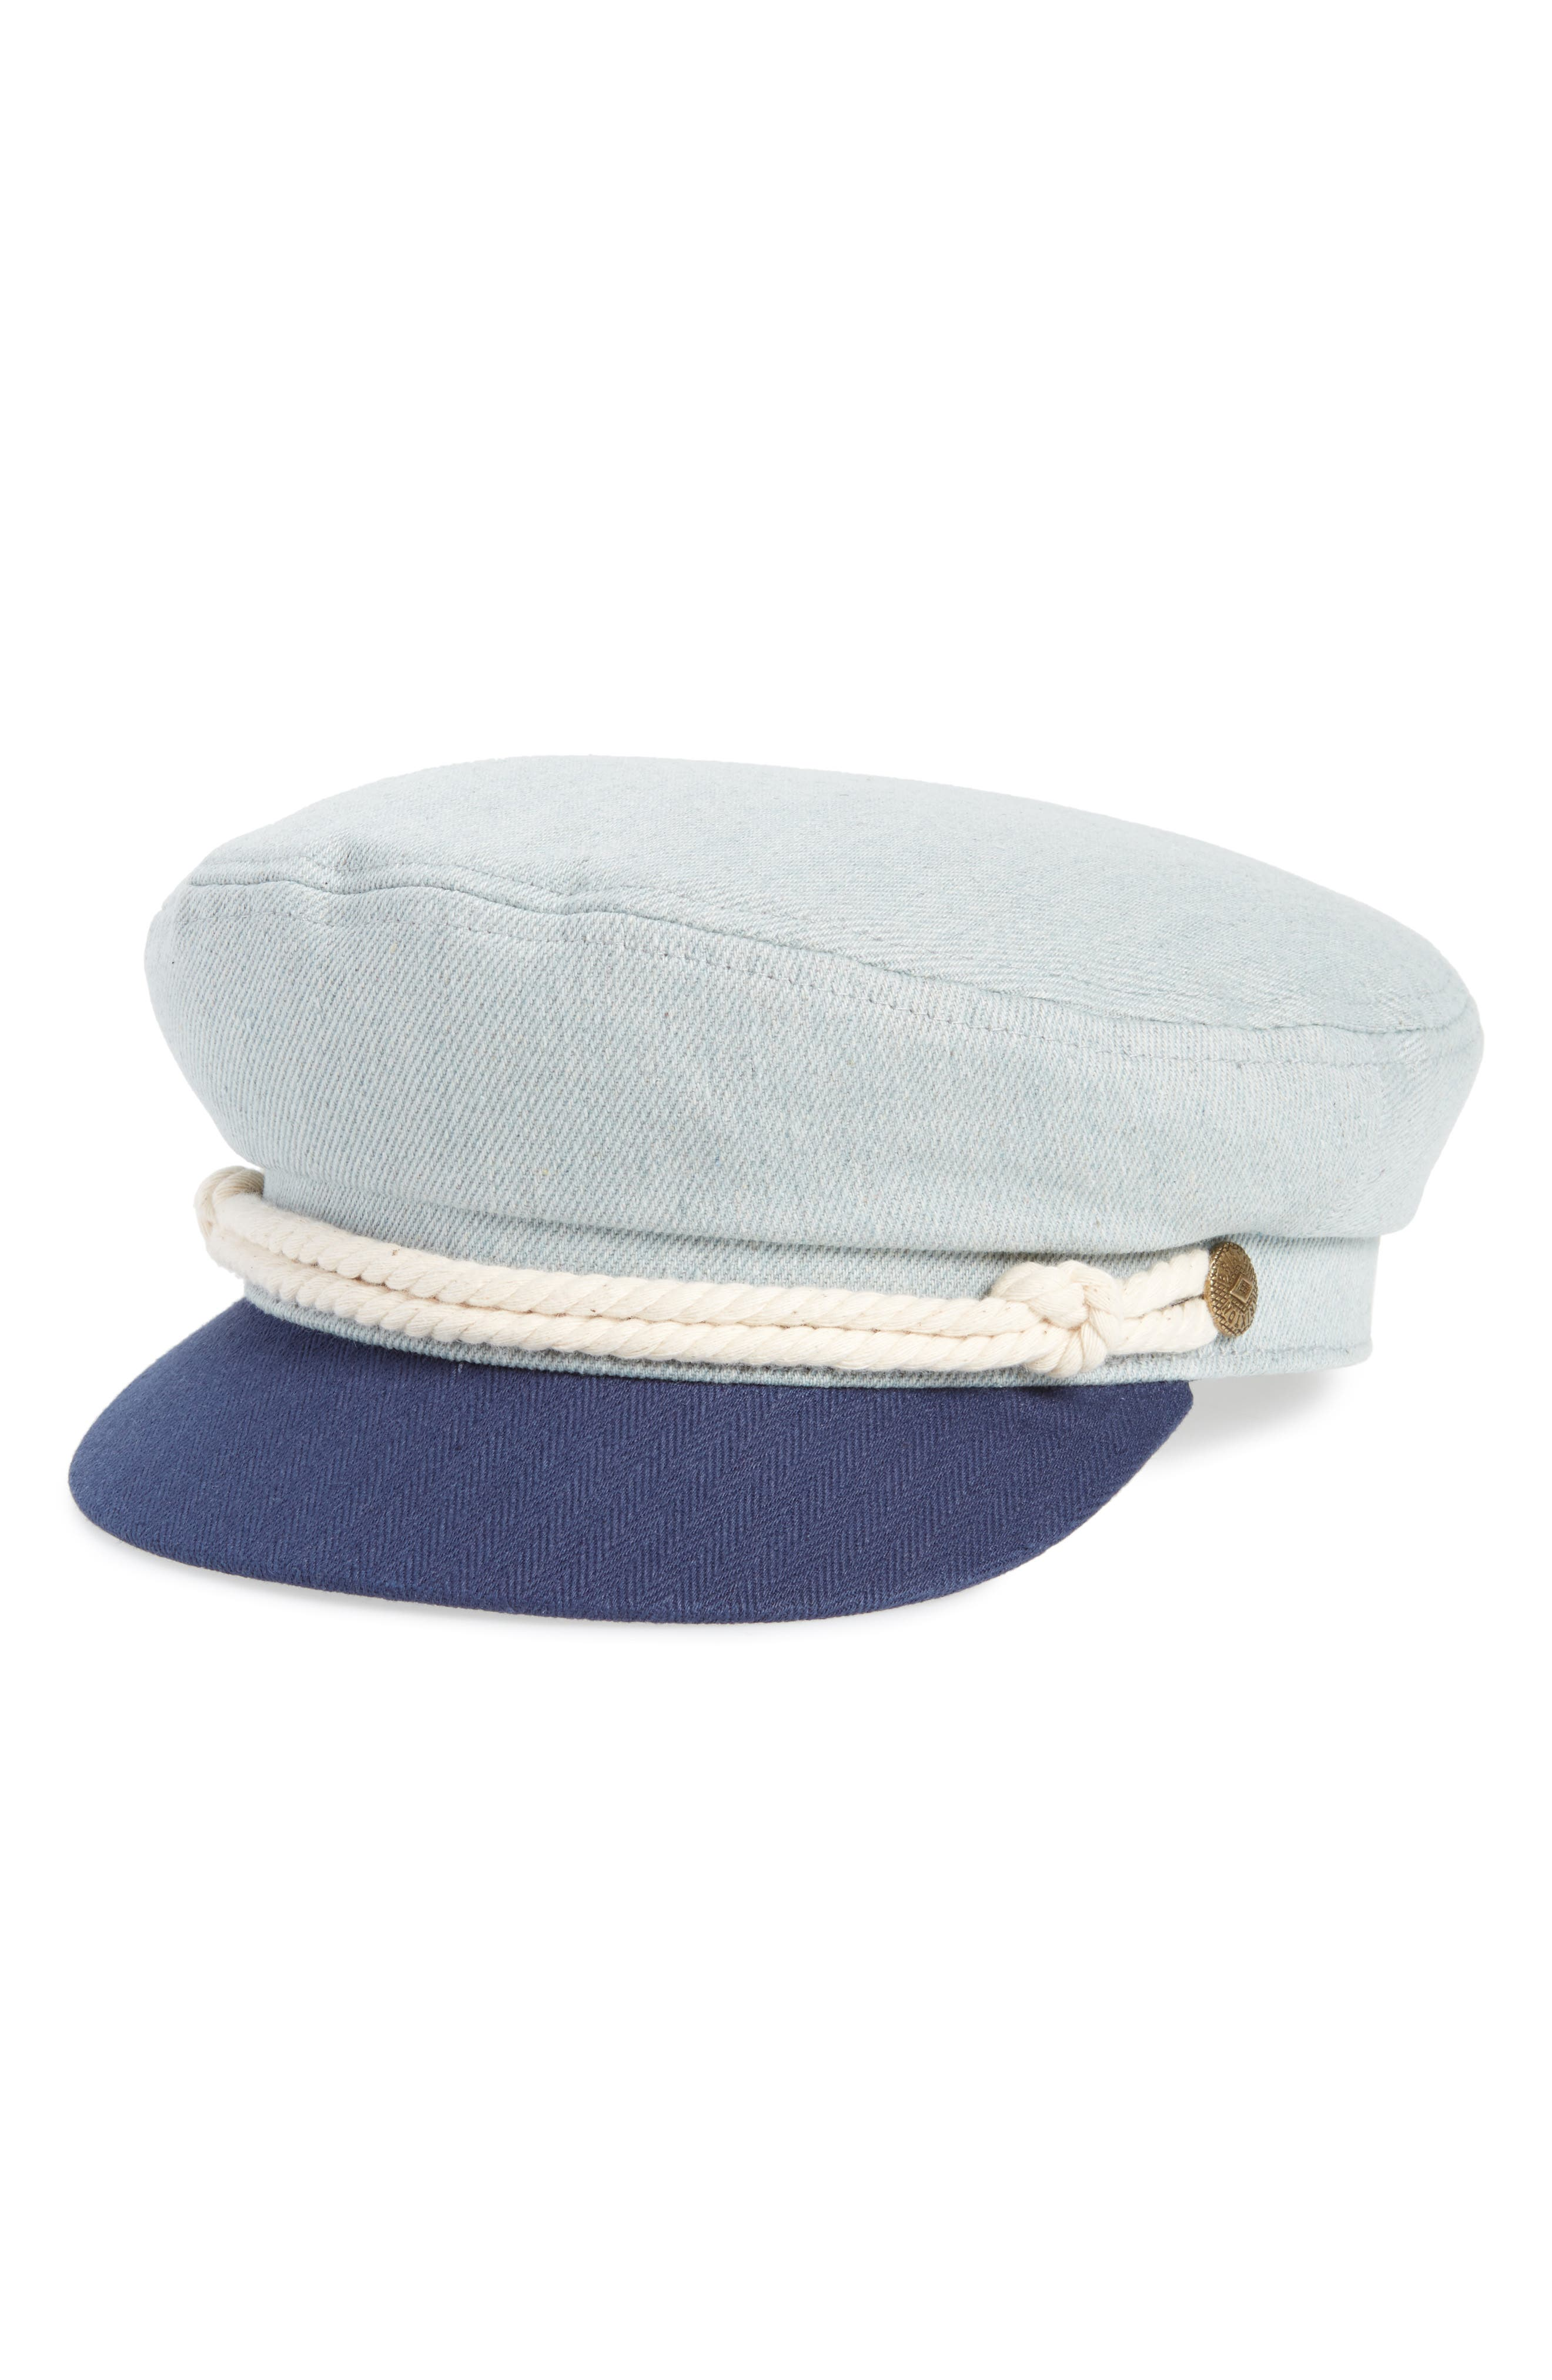 Fiddler Cap,                         Main,                         color, Light Denim/ Navy